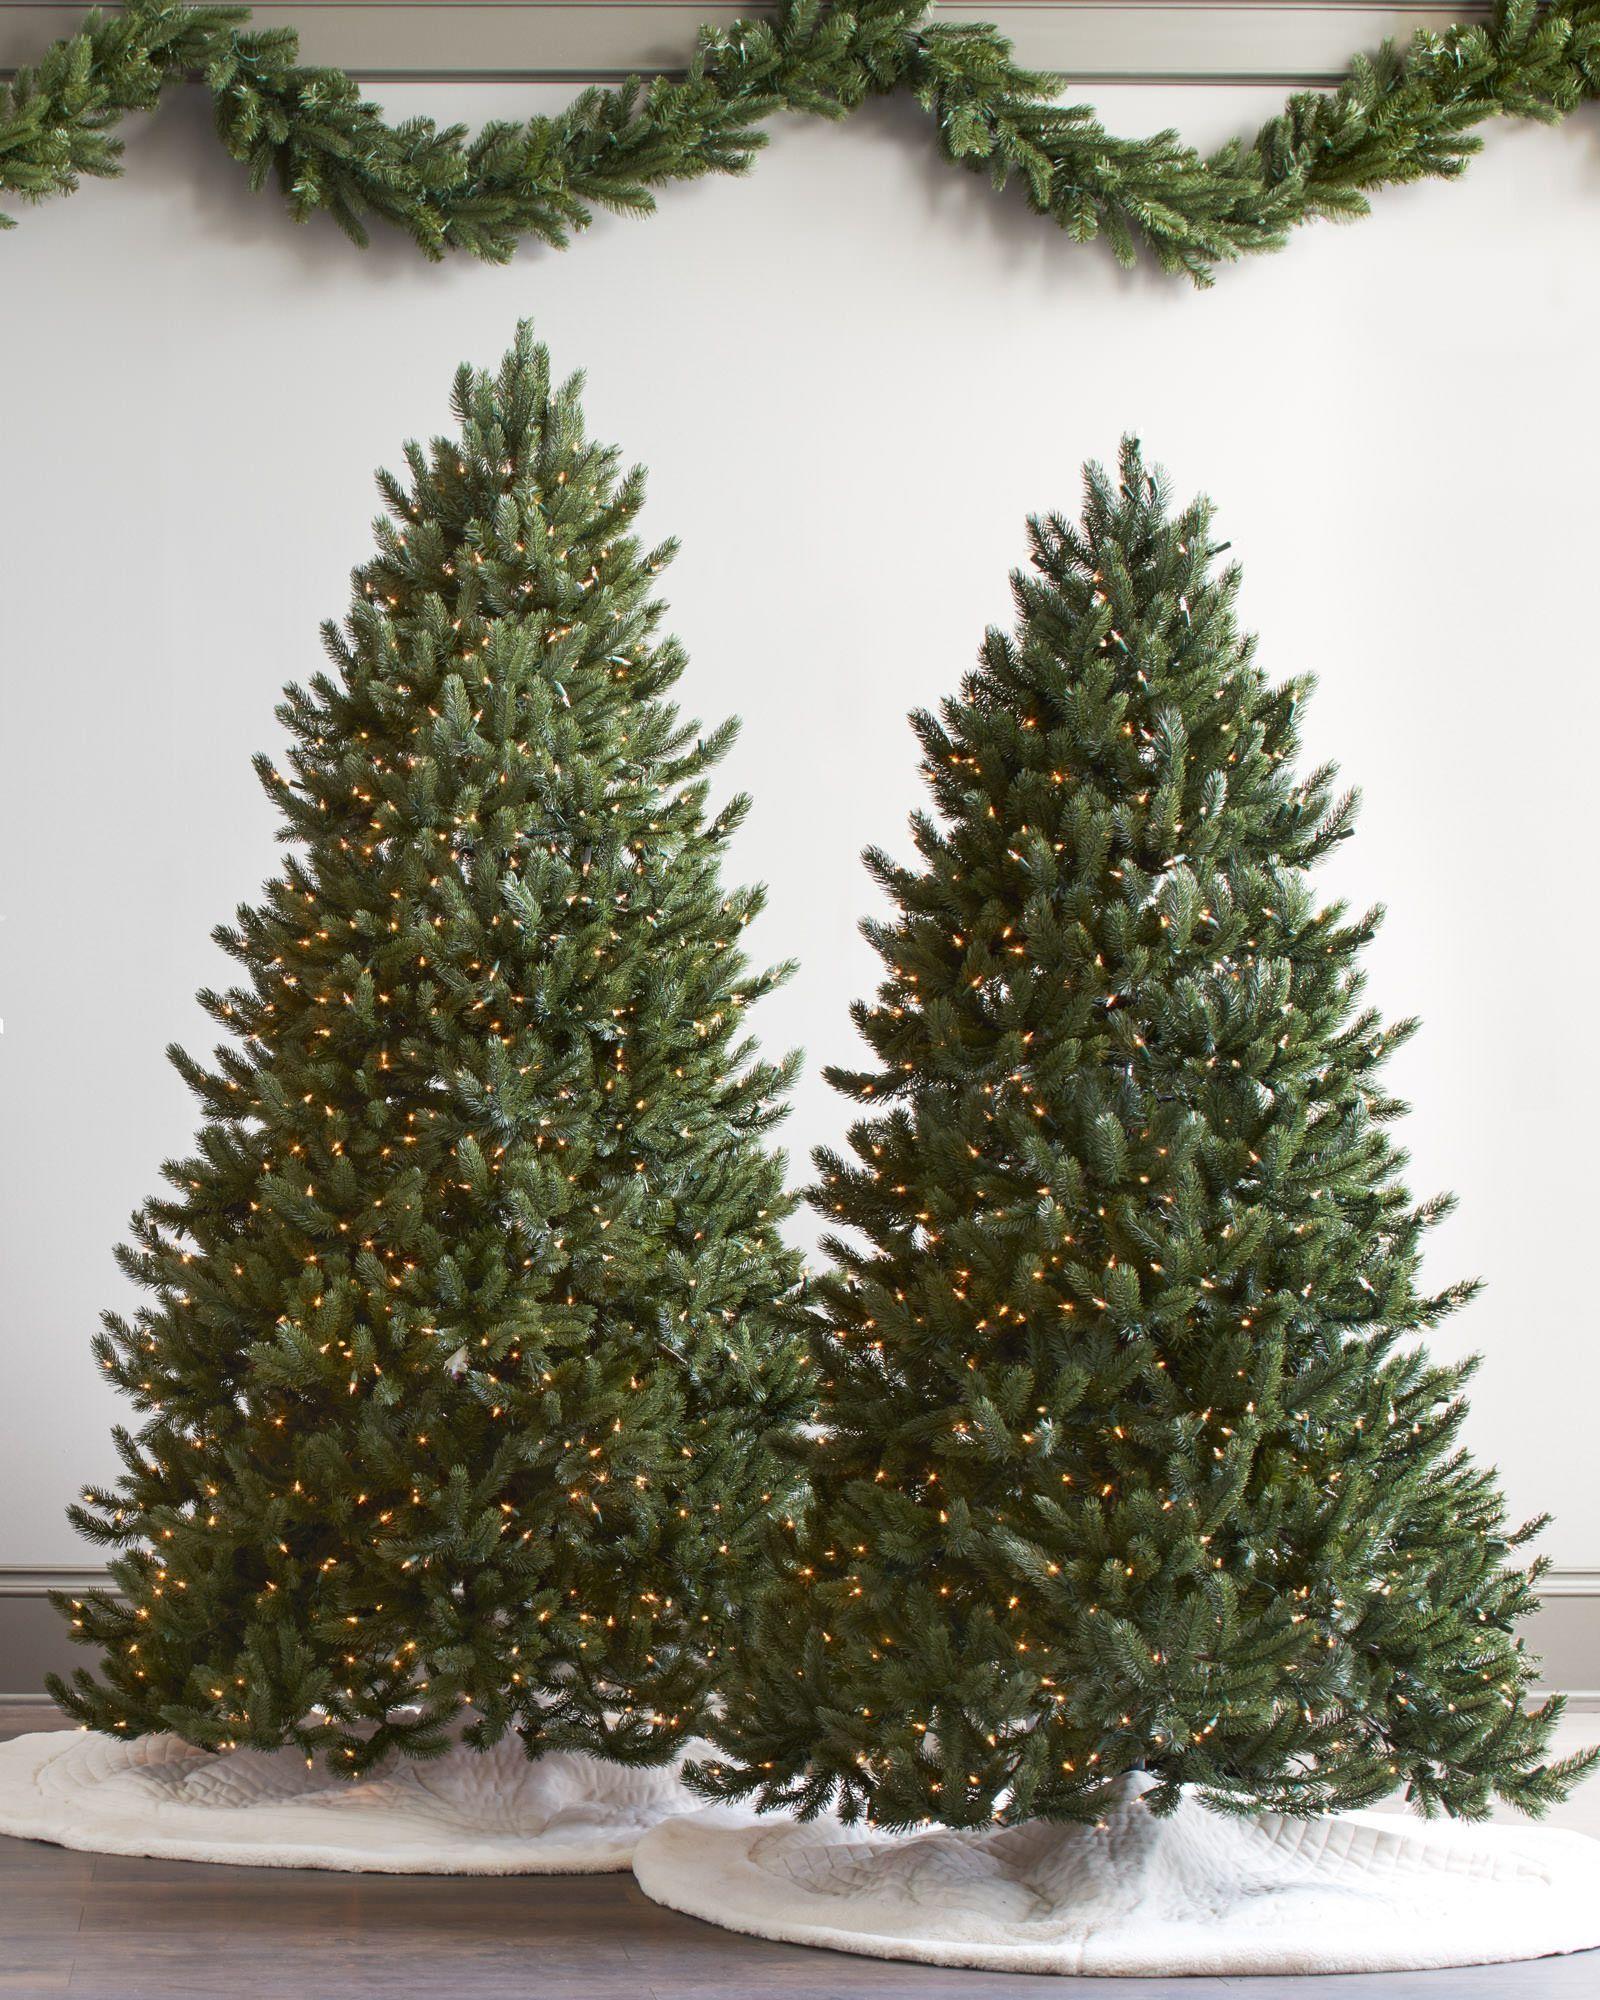 Vermont White Spruce Tree | Balsam Hill